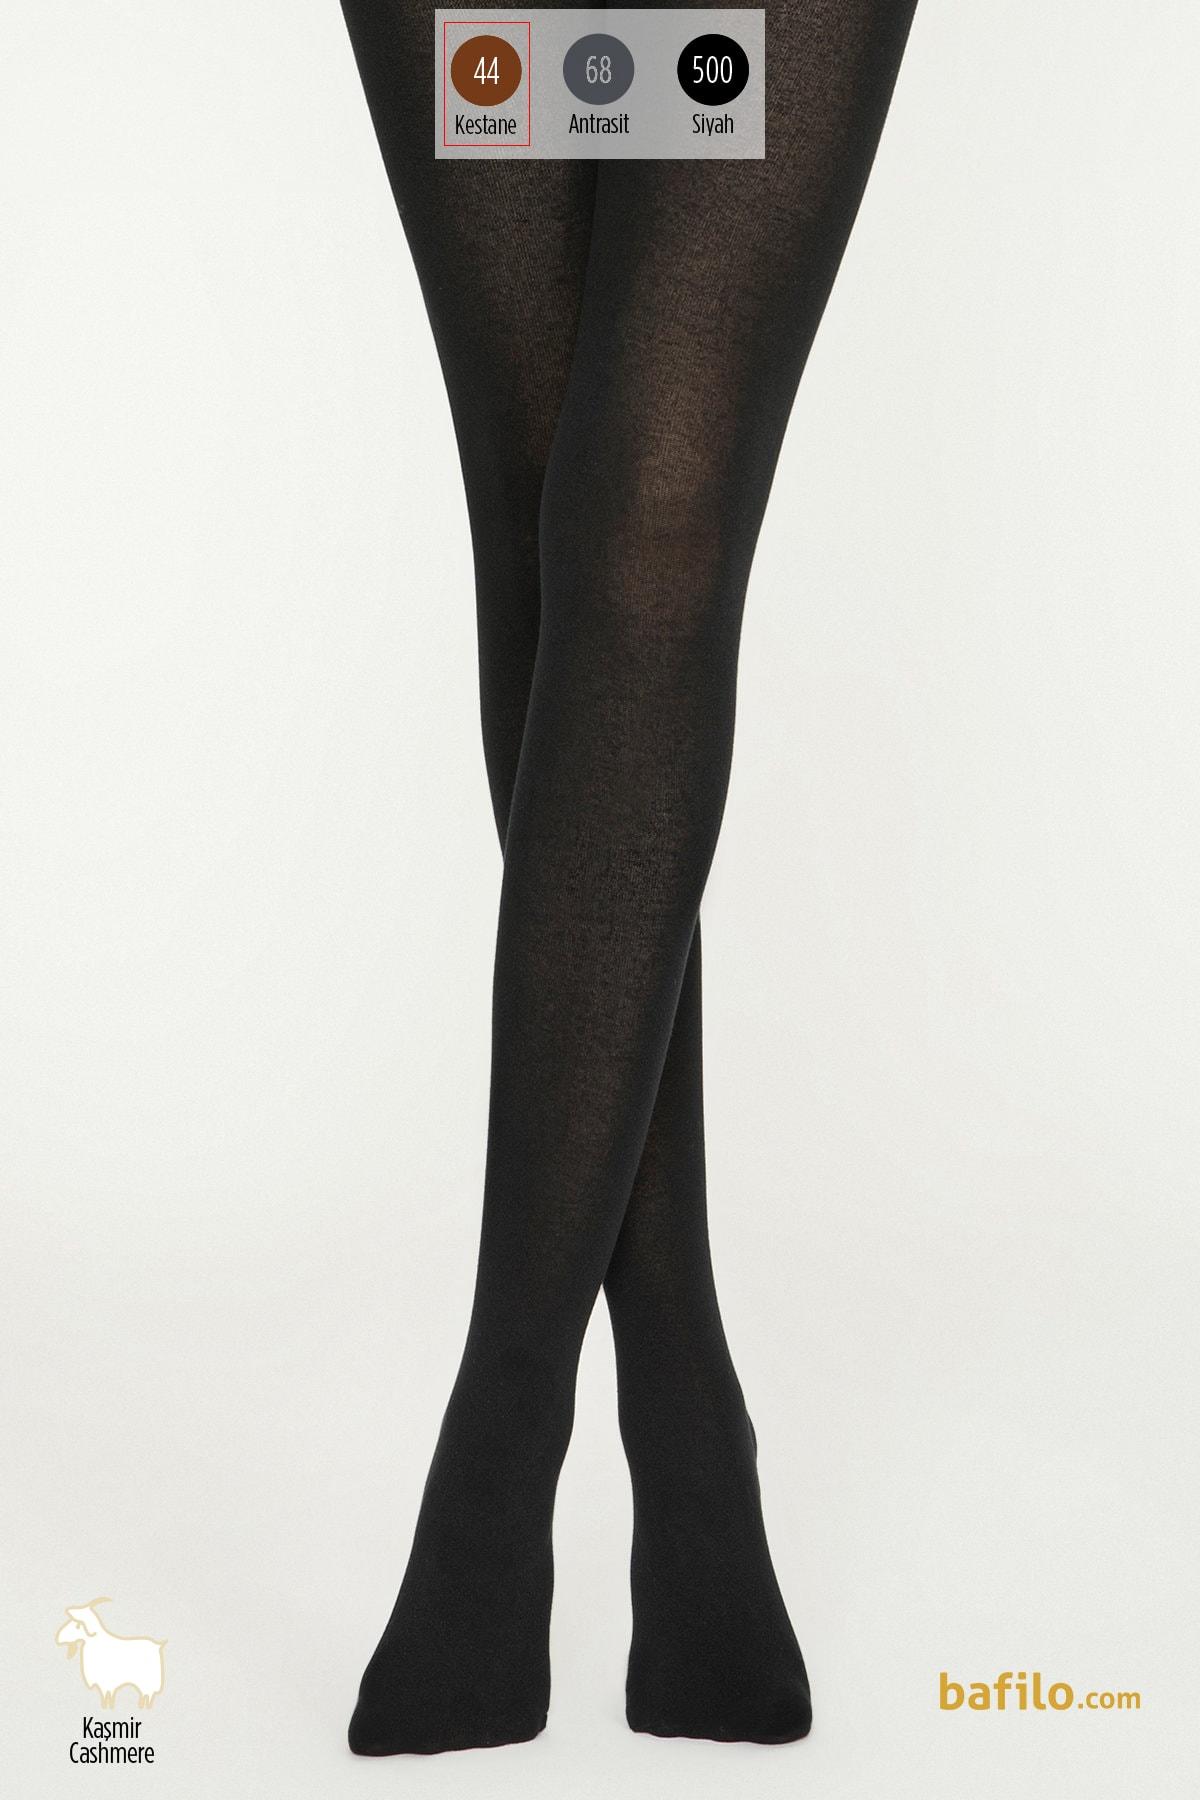 پنتی   Penti - جوراب شلواری کشمیر زنانه Penti قهوه ای سوخته